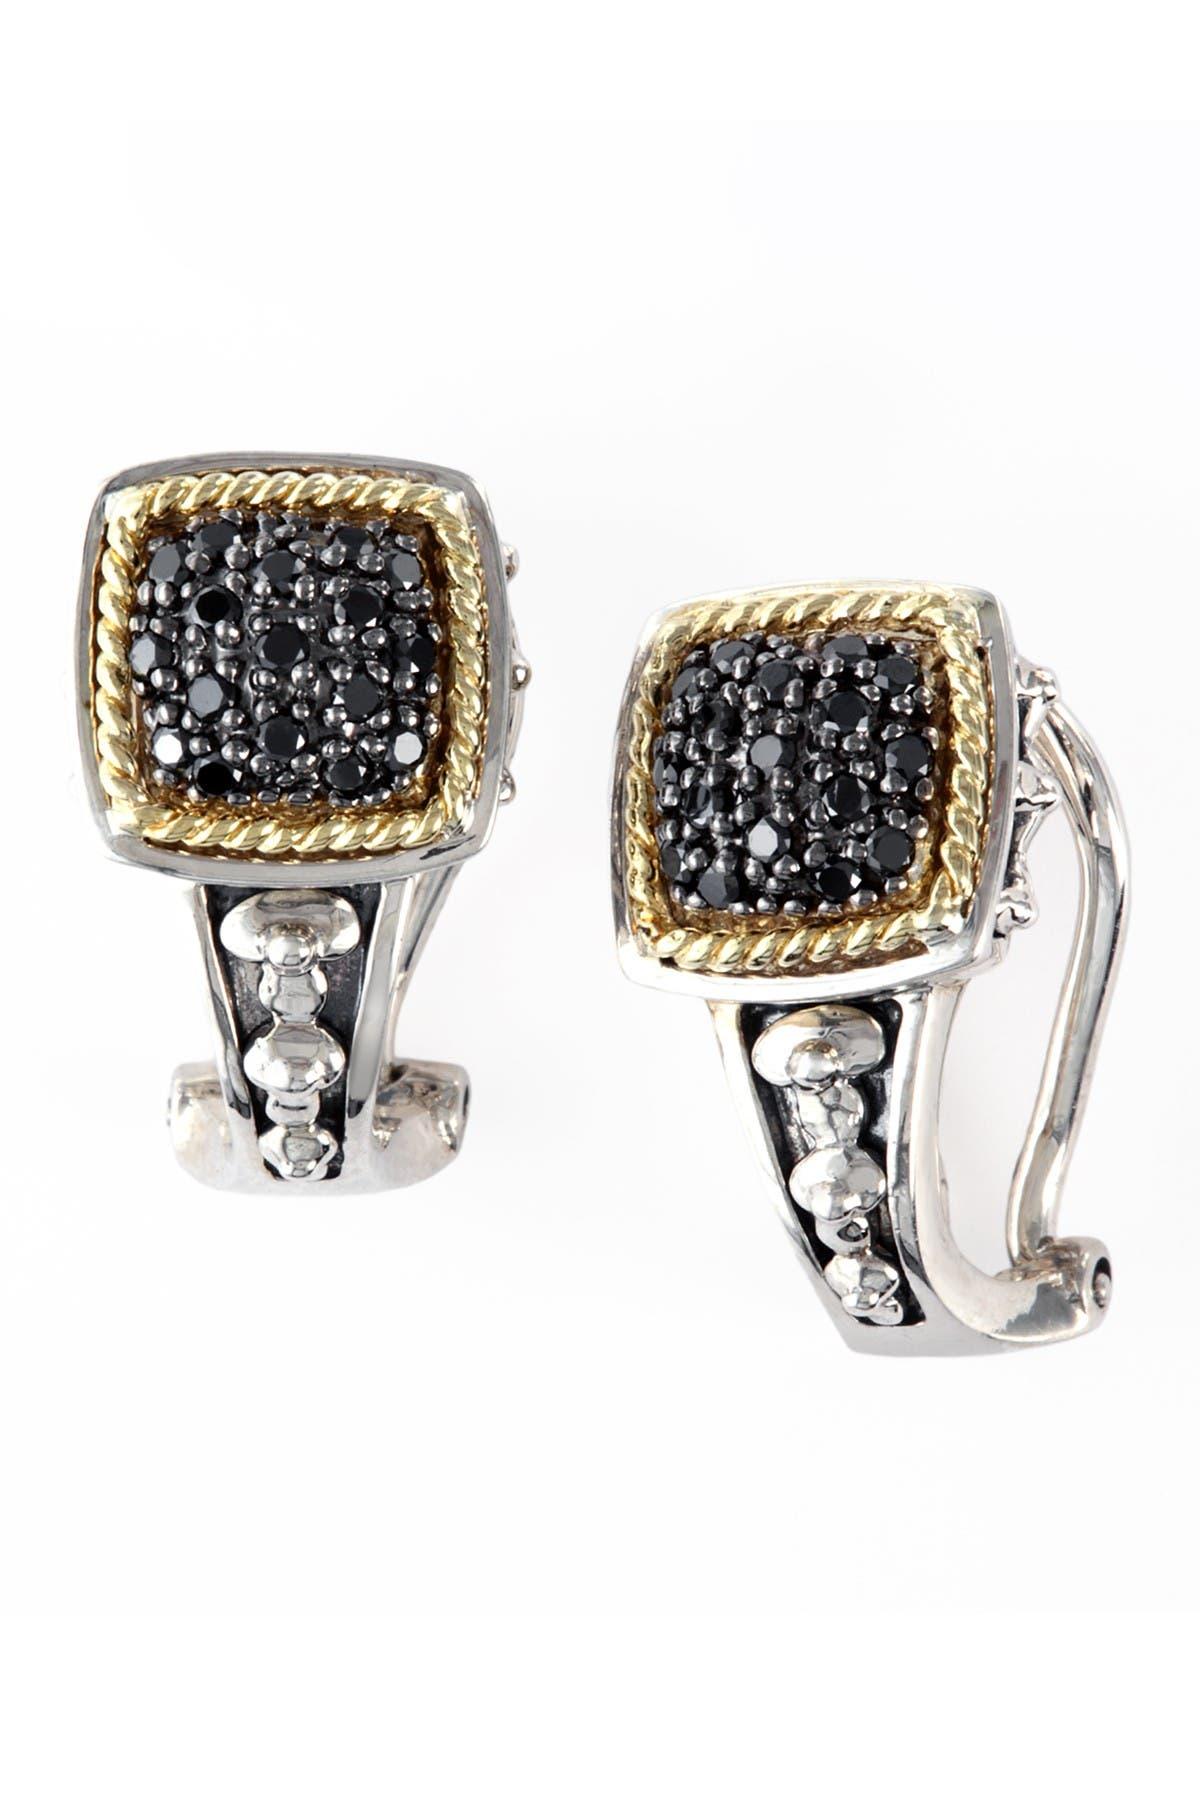 Effy Sterling Silver 18k Yellow Gold Pave Black Diamond Earrings 0 26 Ctw Nordstrom Rack